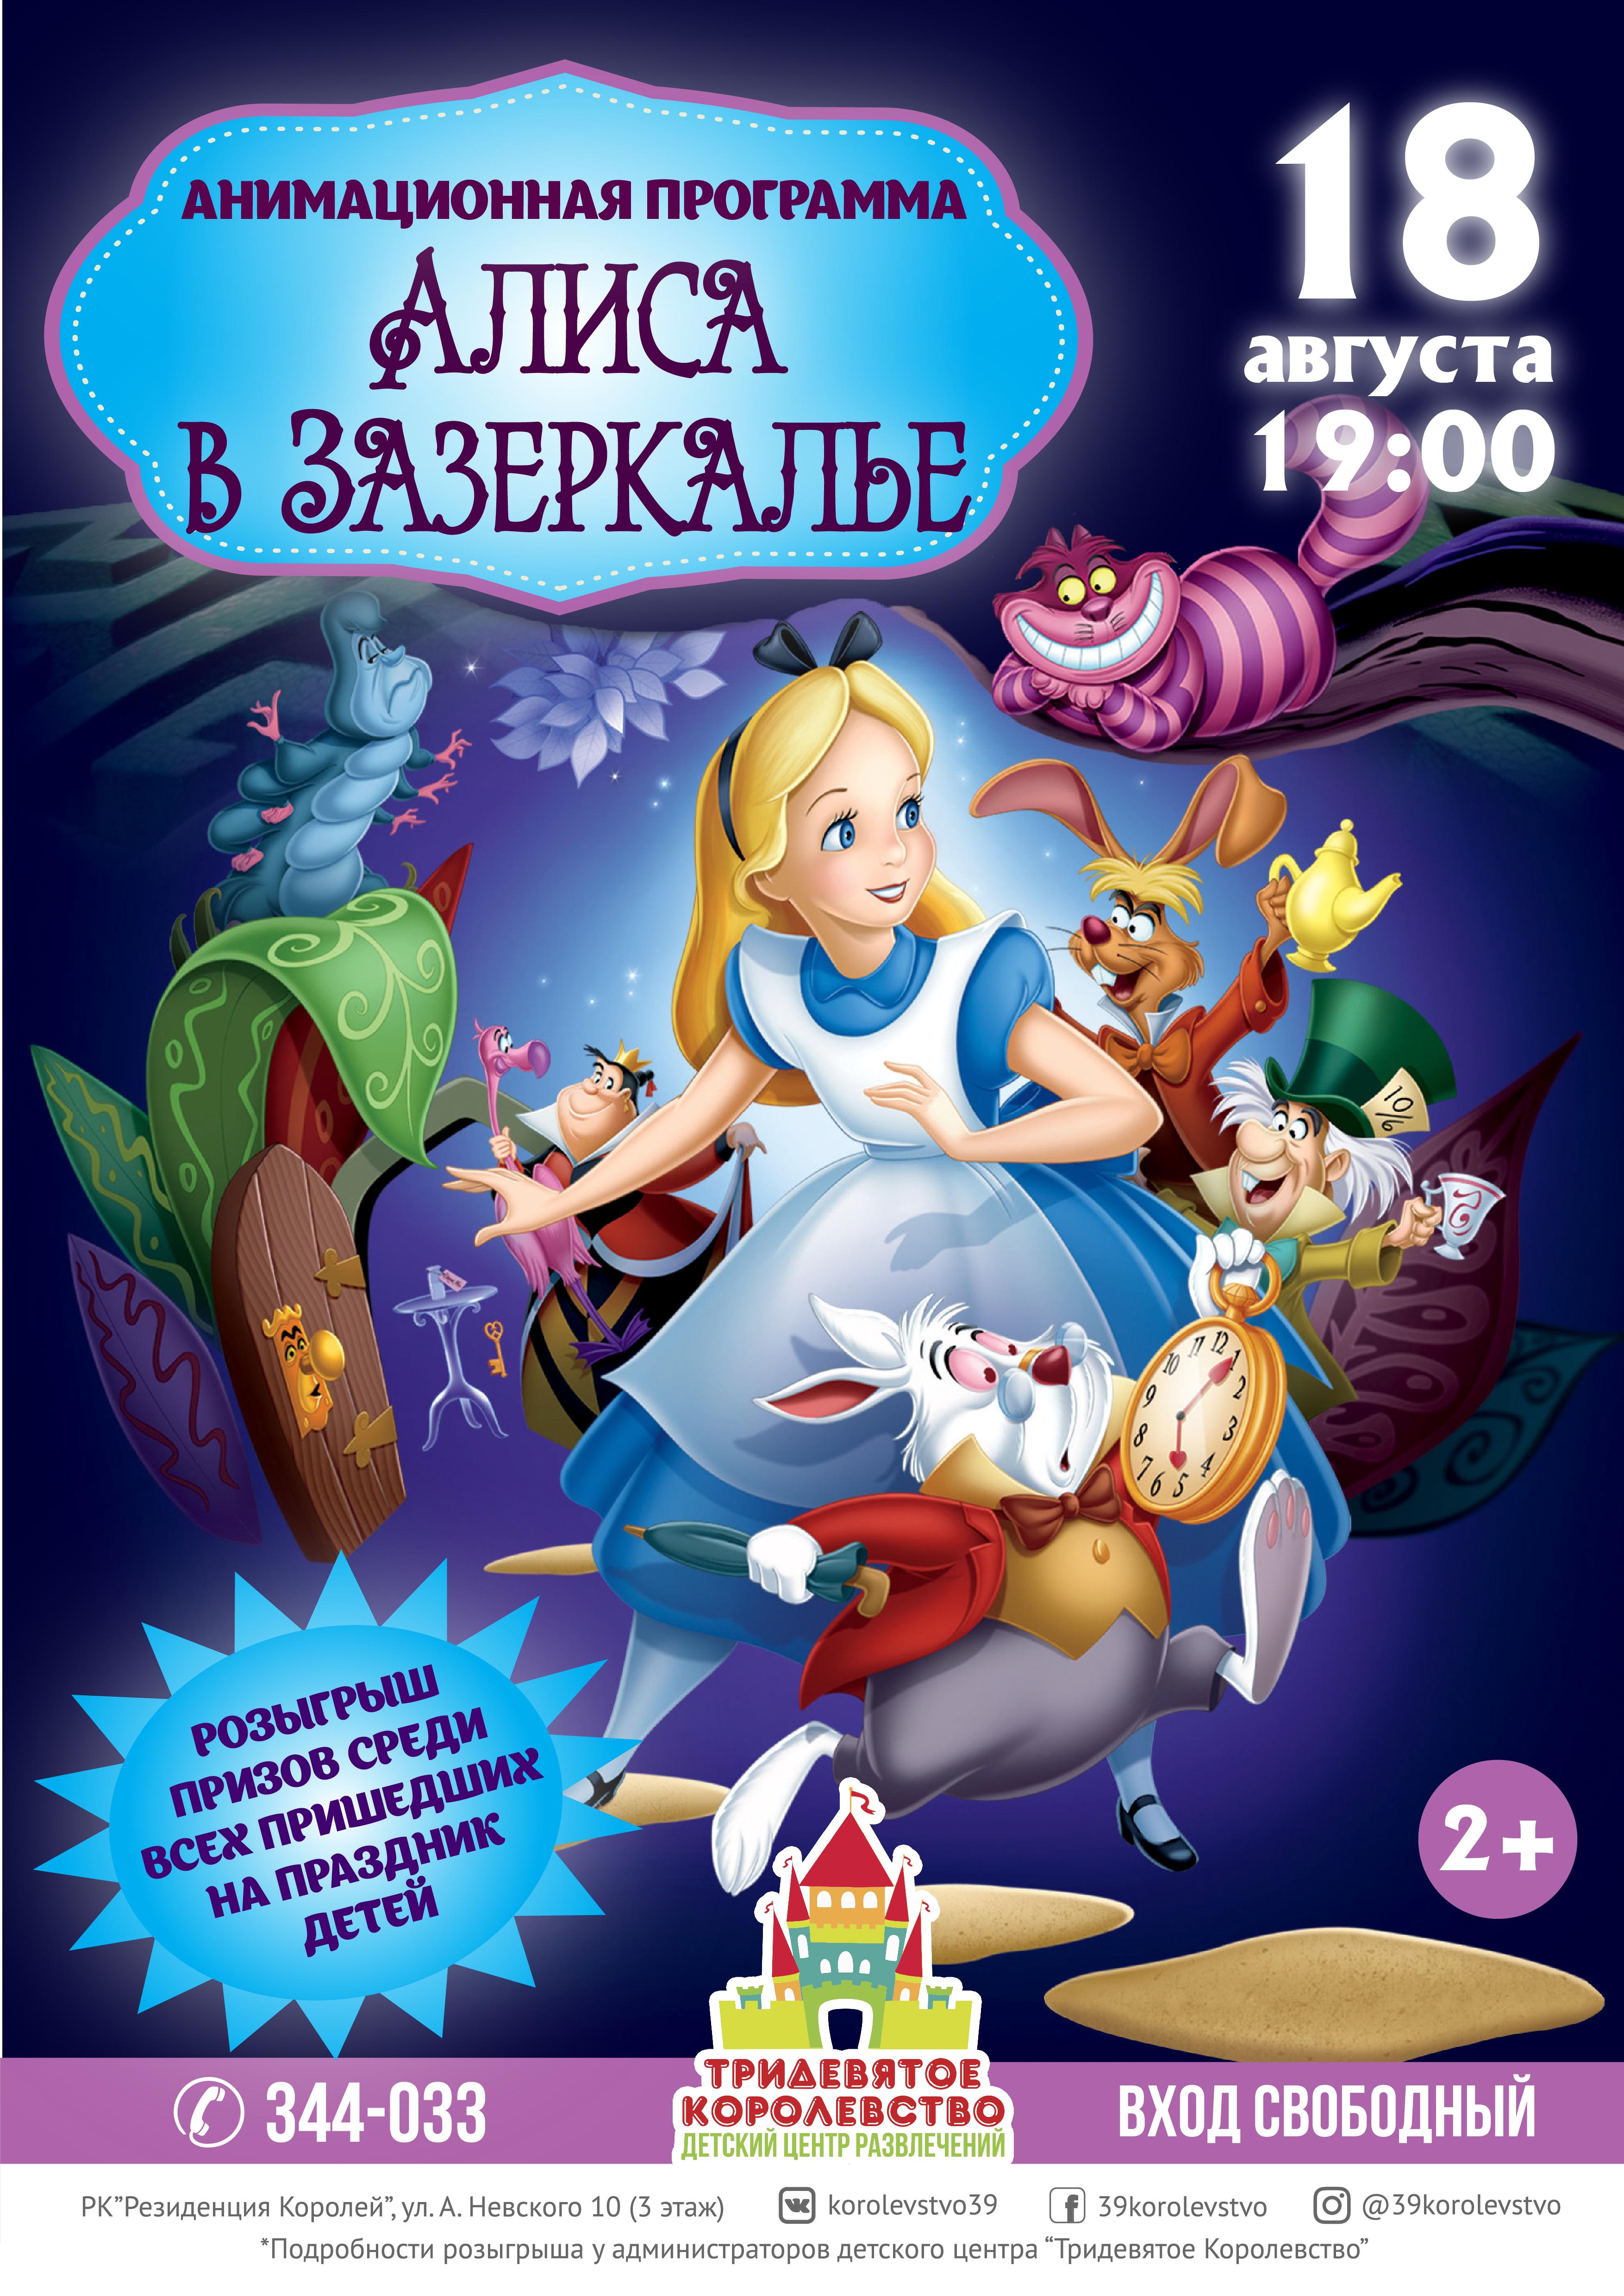 18 августа Алиса в Зазеркалье А1